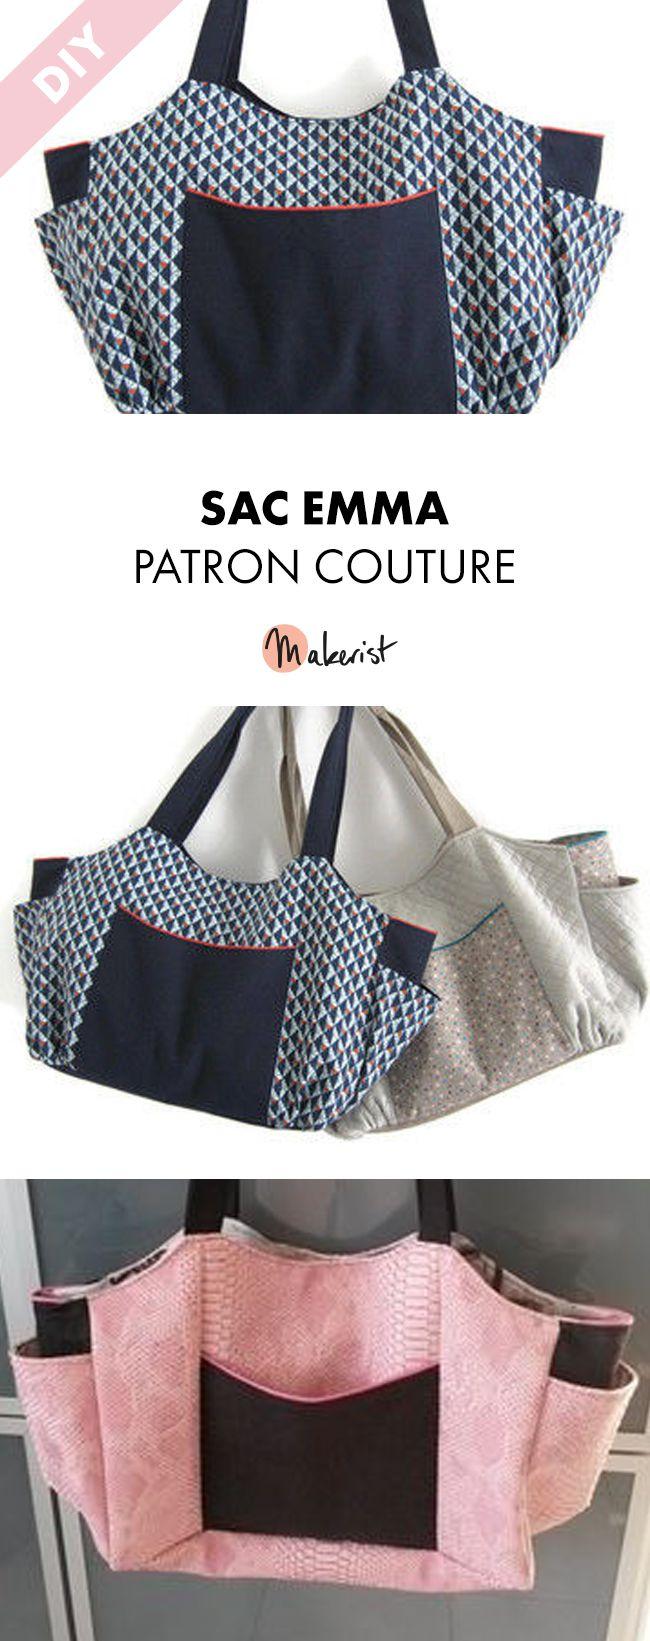 best 25 patron sac ideas on pinterest patron couture. Black Bedroom Furniture Sets. Home Design Ideas